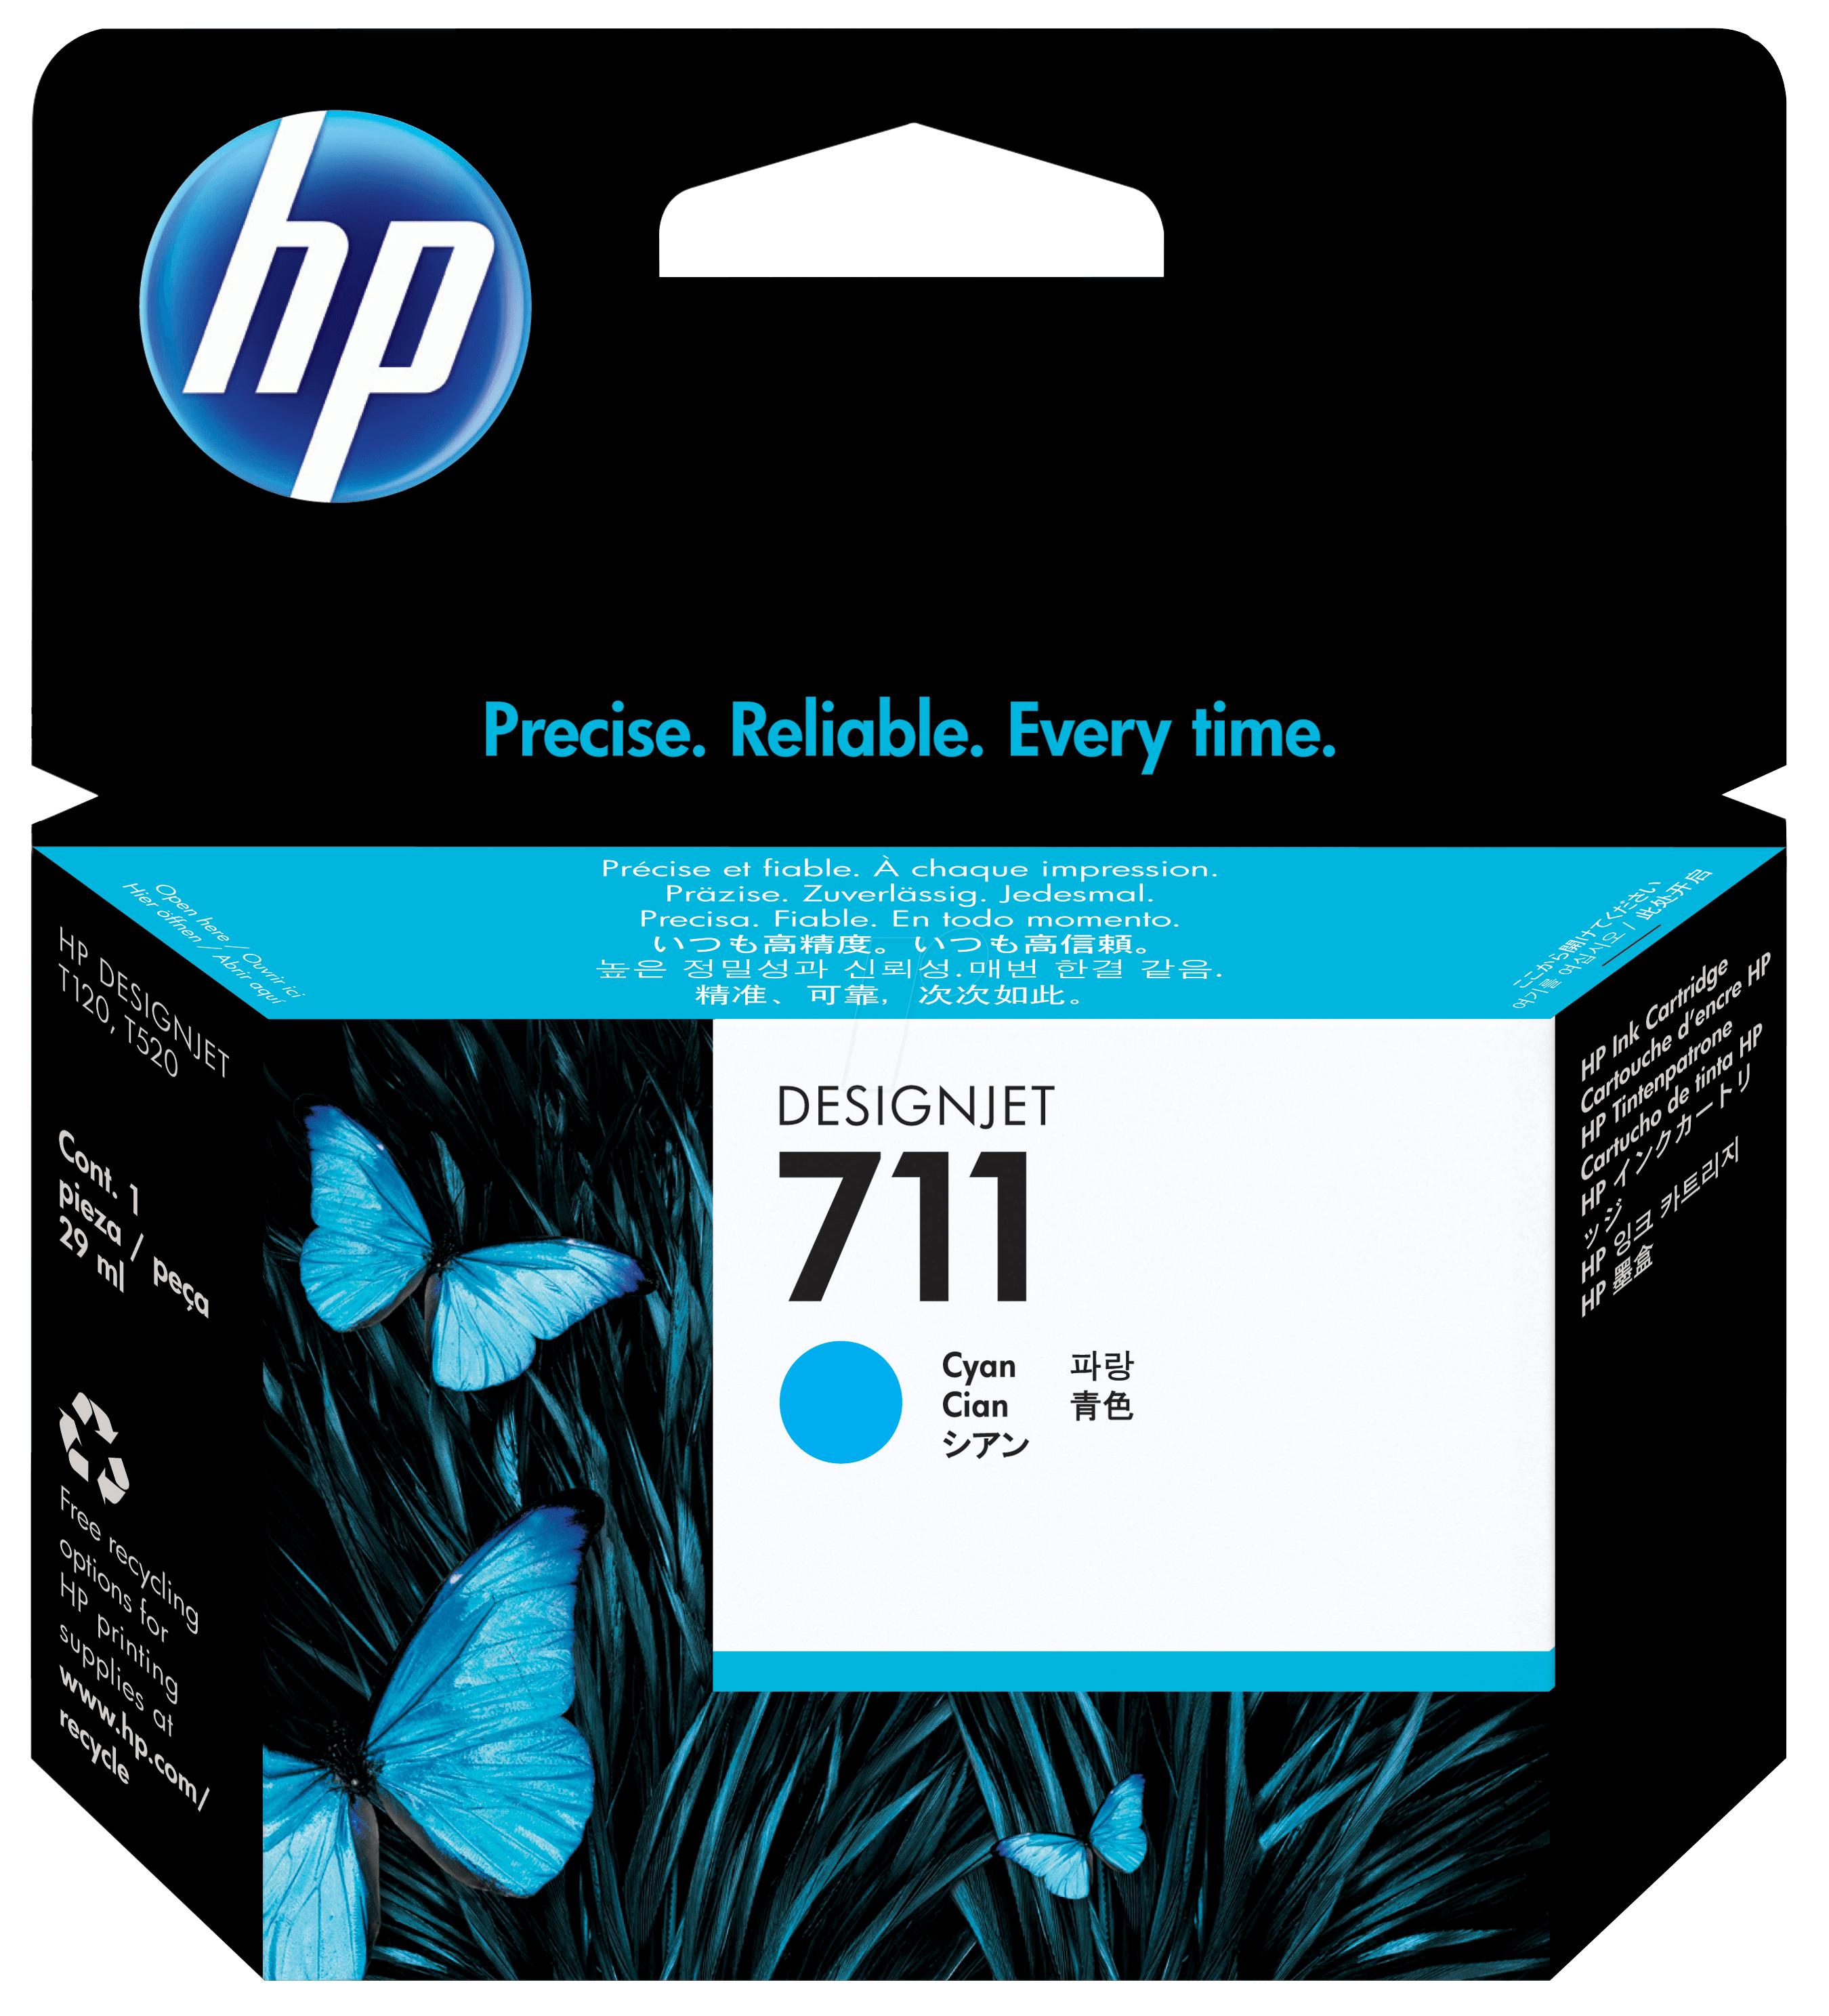 TINTE CZ130A - Tinte - HP - cyan - 711 - original